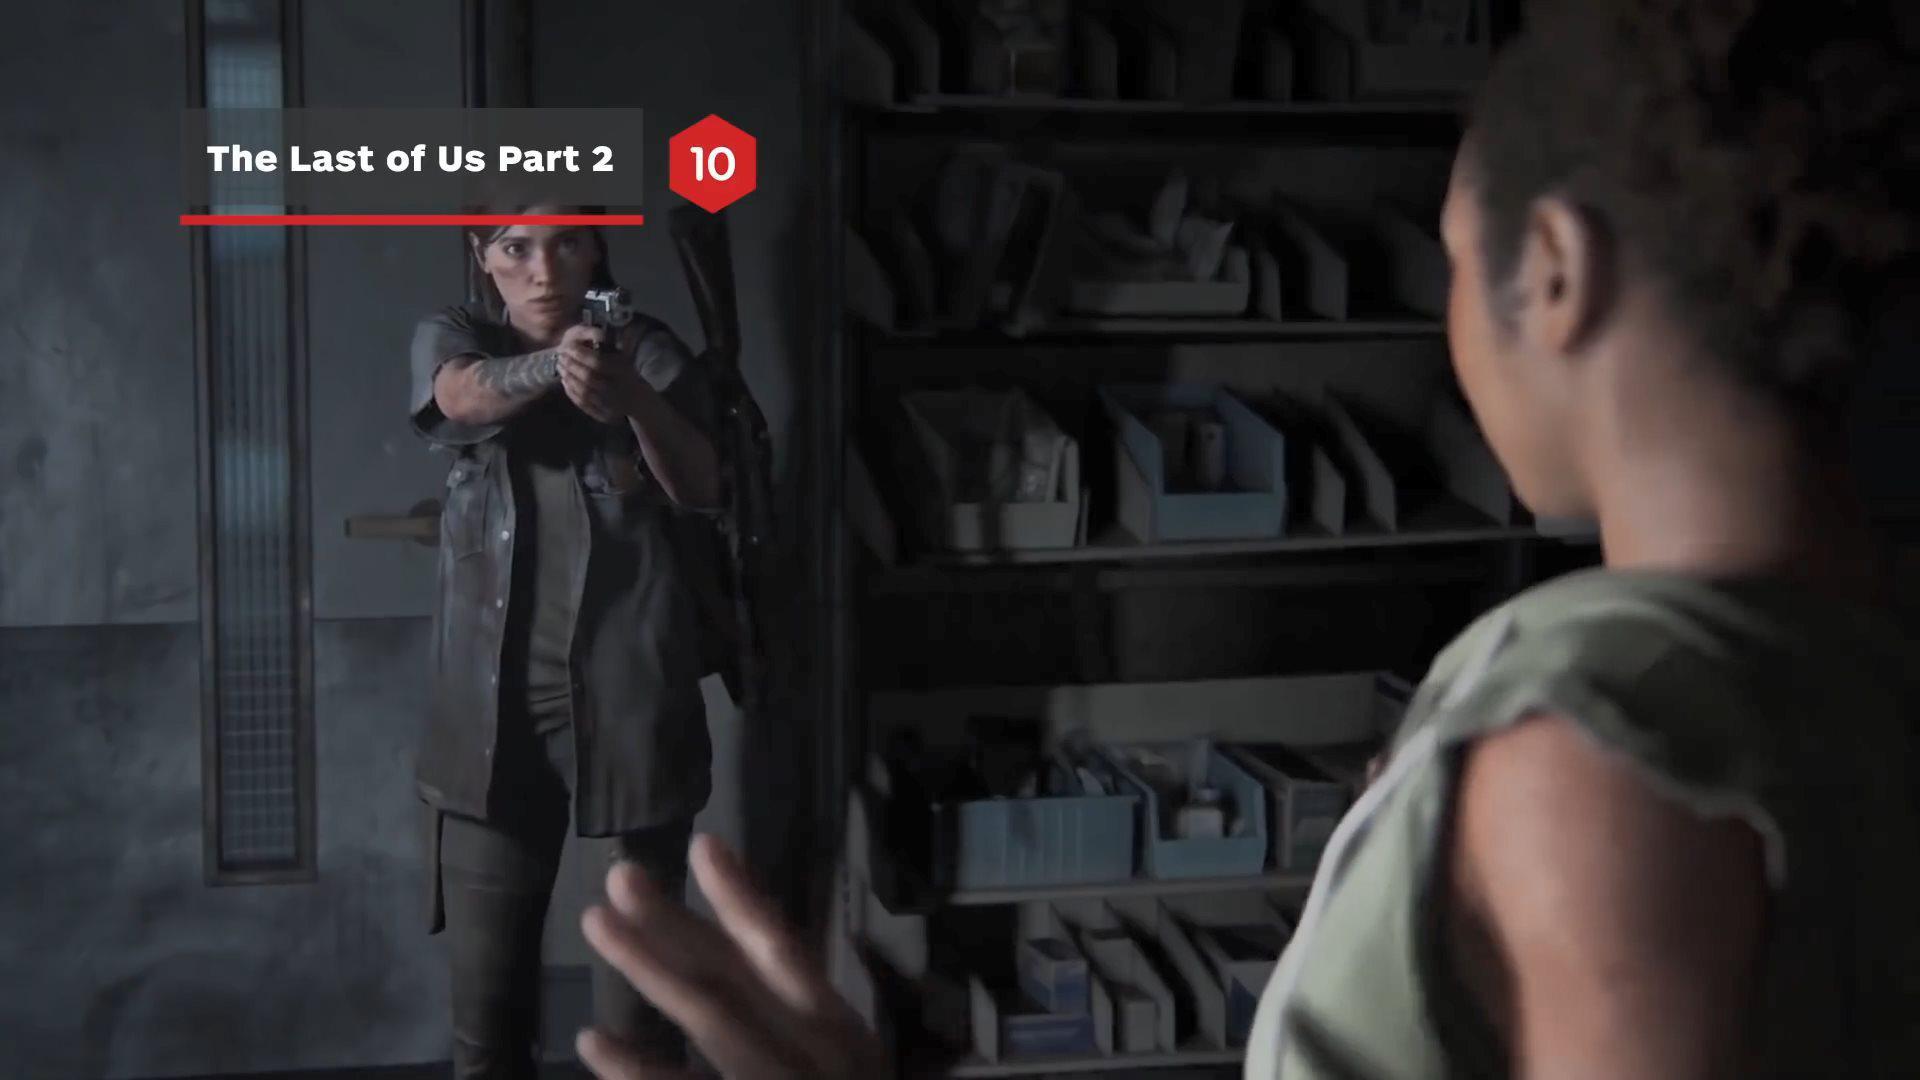 IGN評選2020年上半年最棒的32款遊戲 3款滿分作品